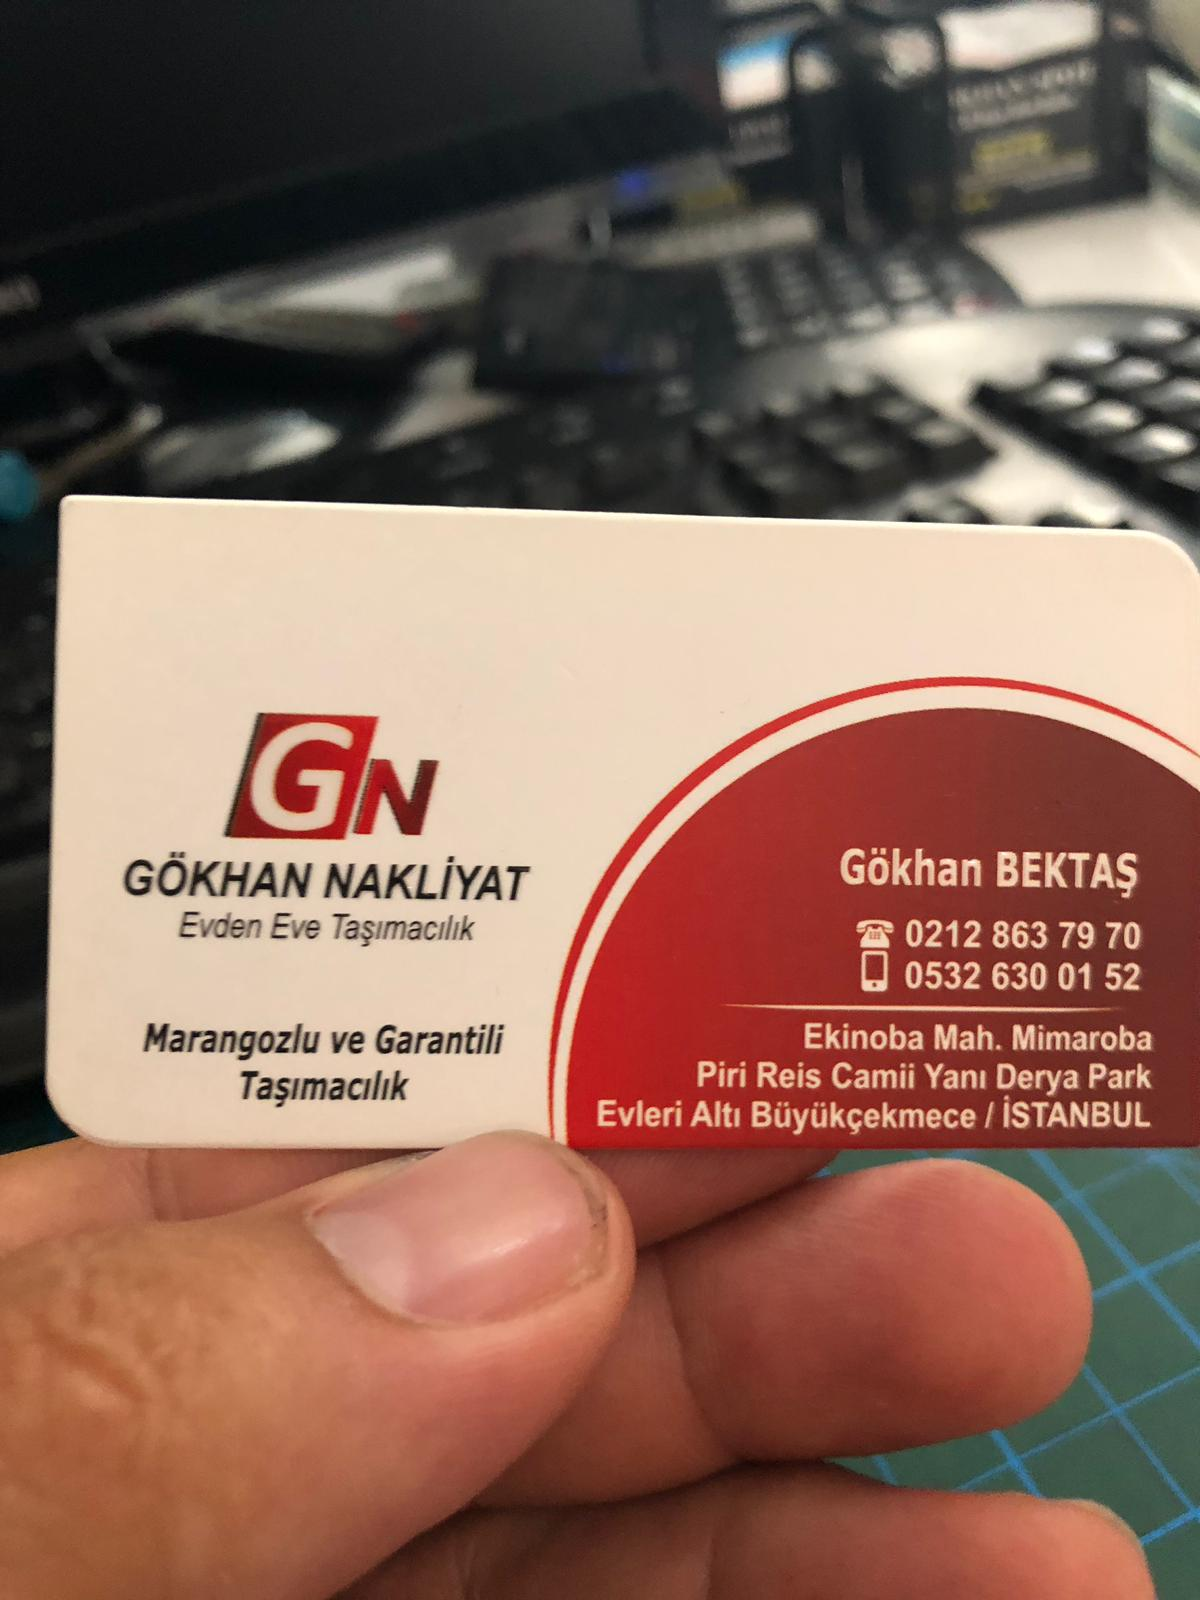 Gökhan Nakliyat Karvizit 2019